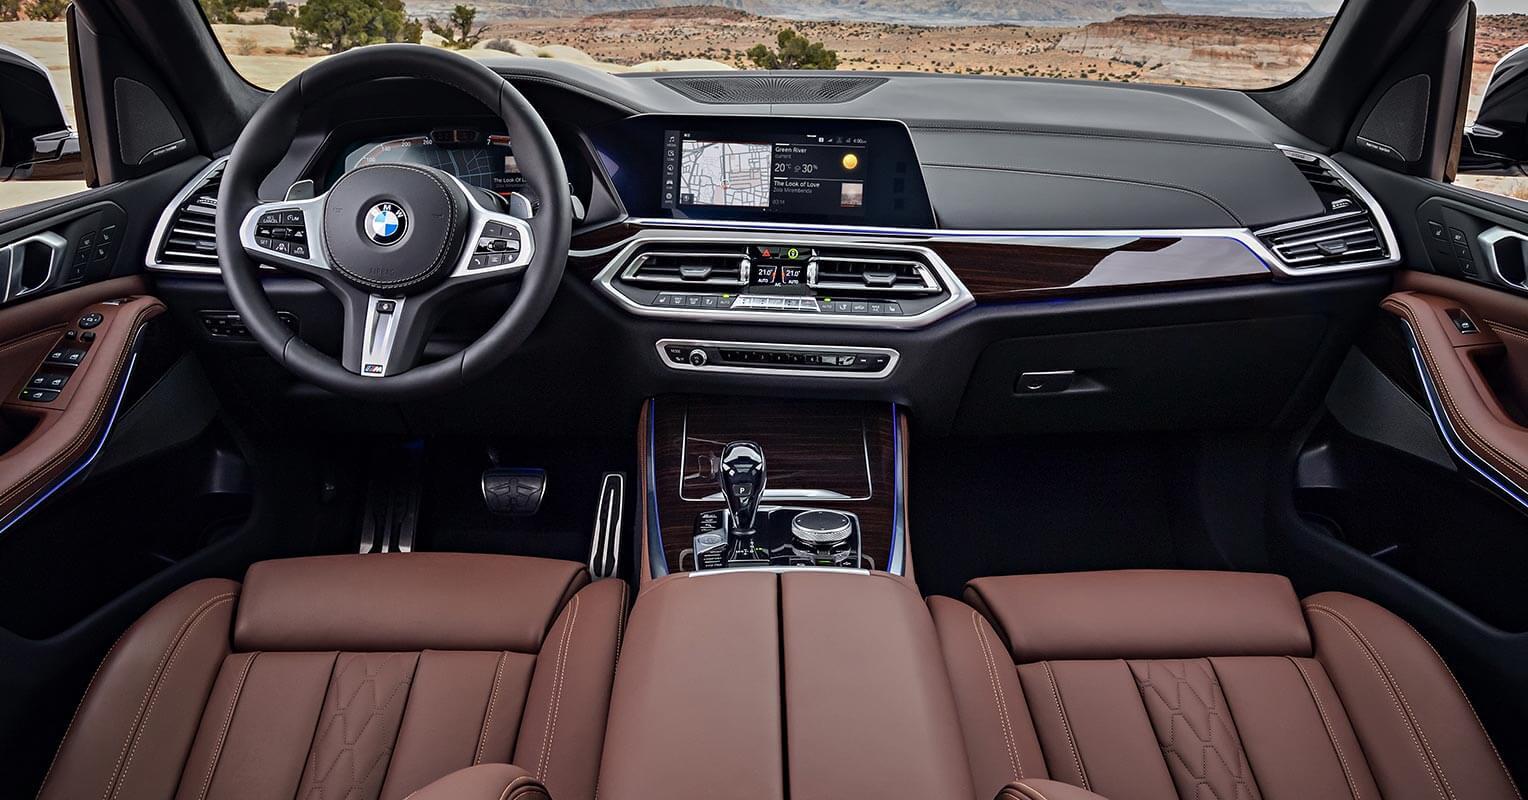 BMW X5 2018 interior